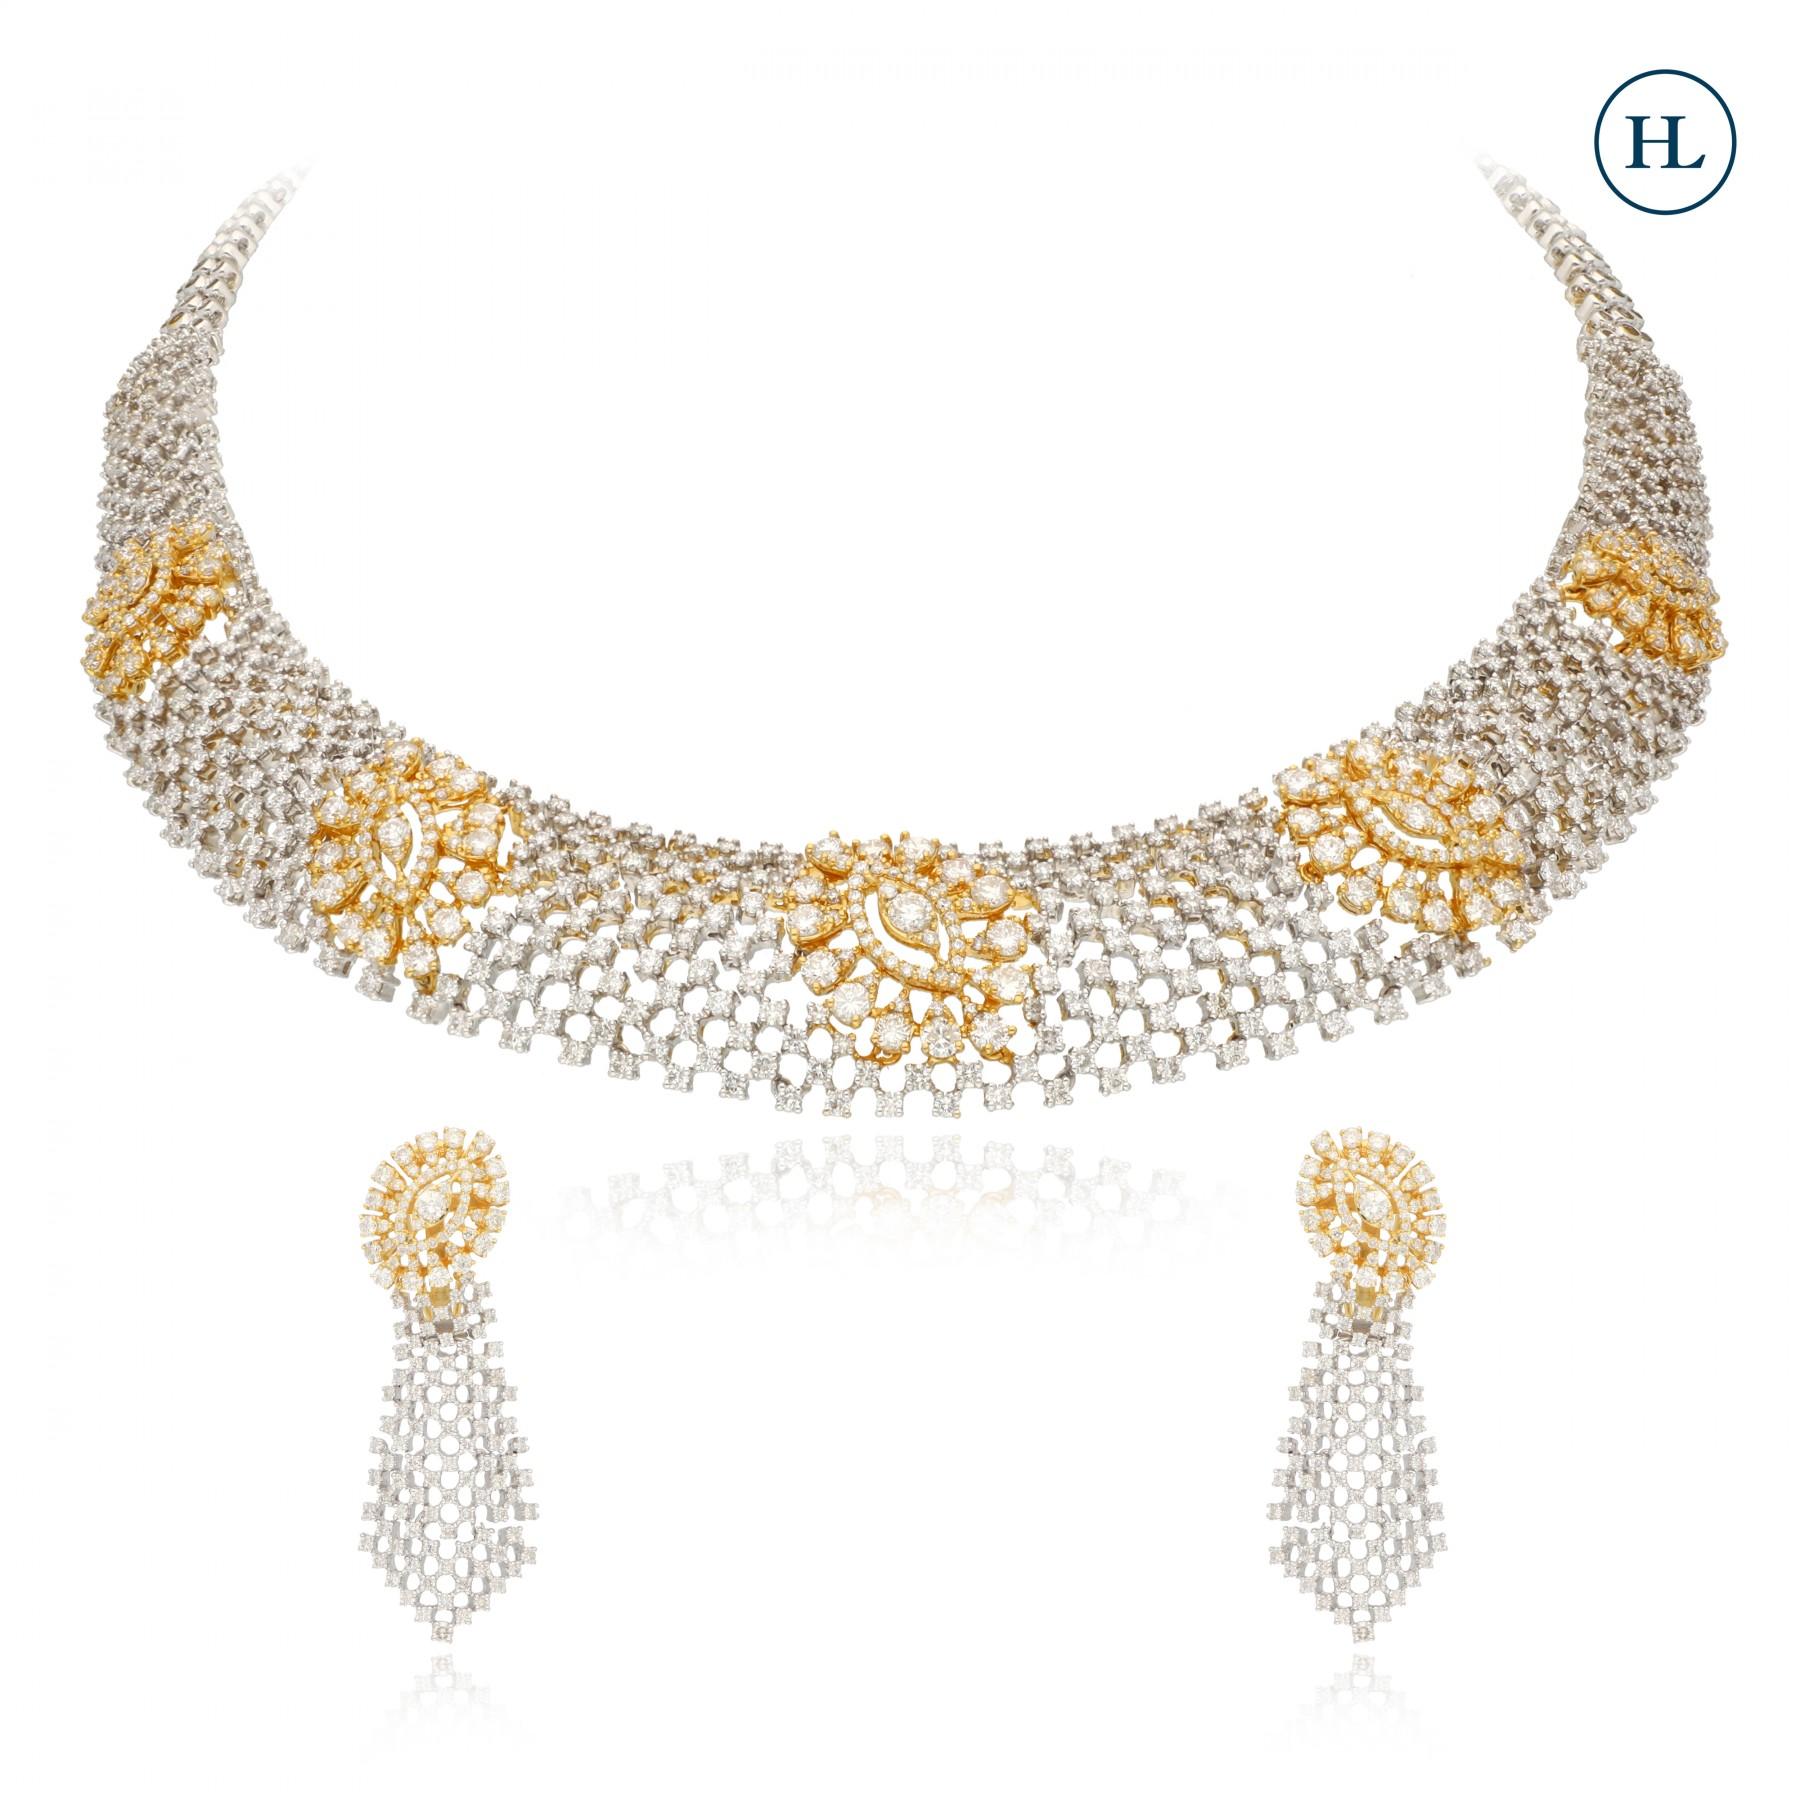 Criss Cross Diamond Necklace Set